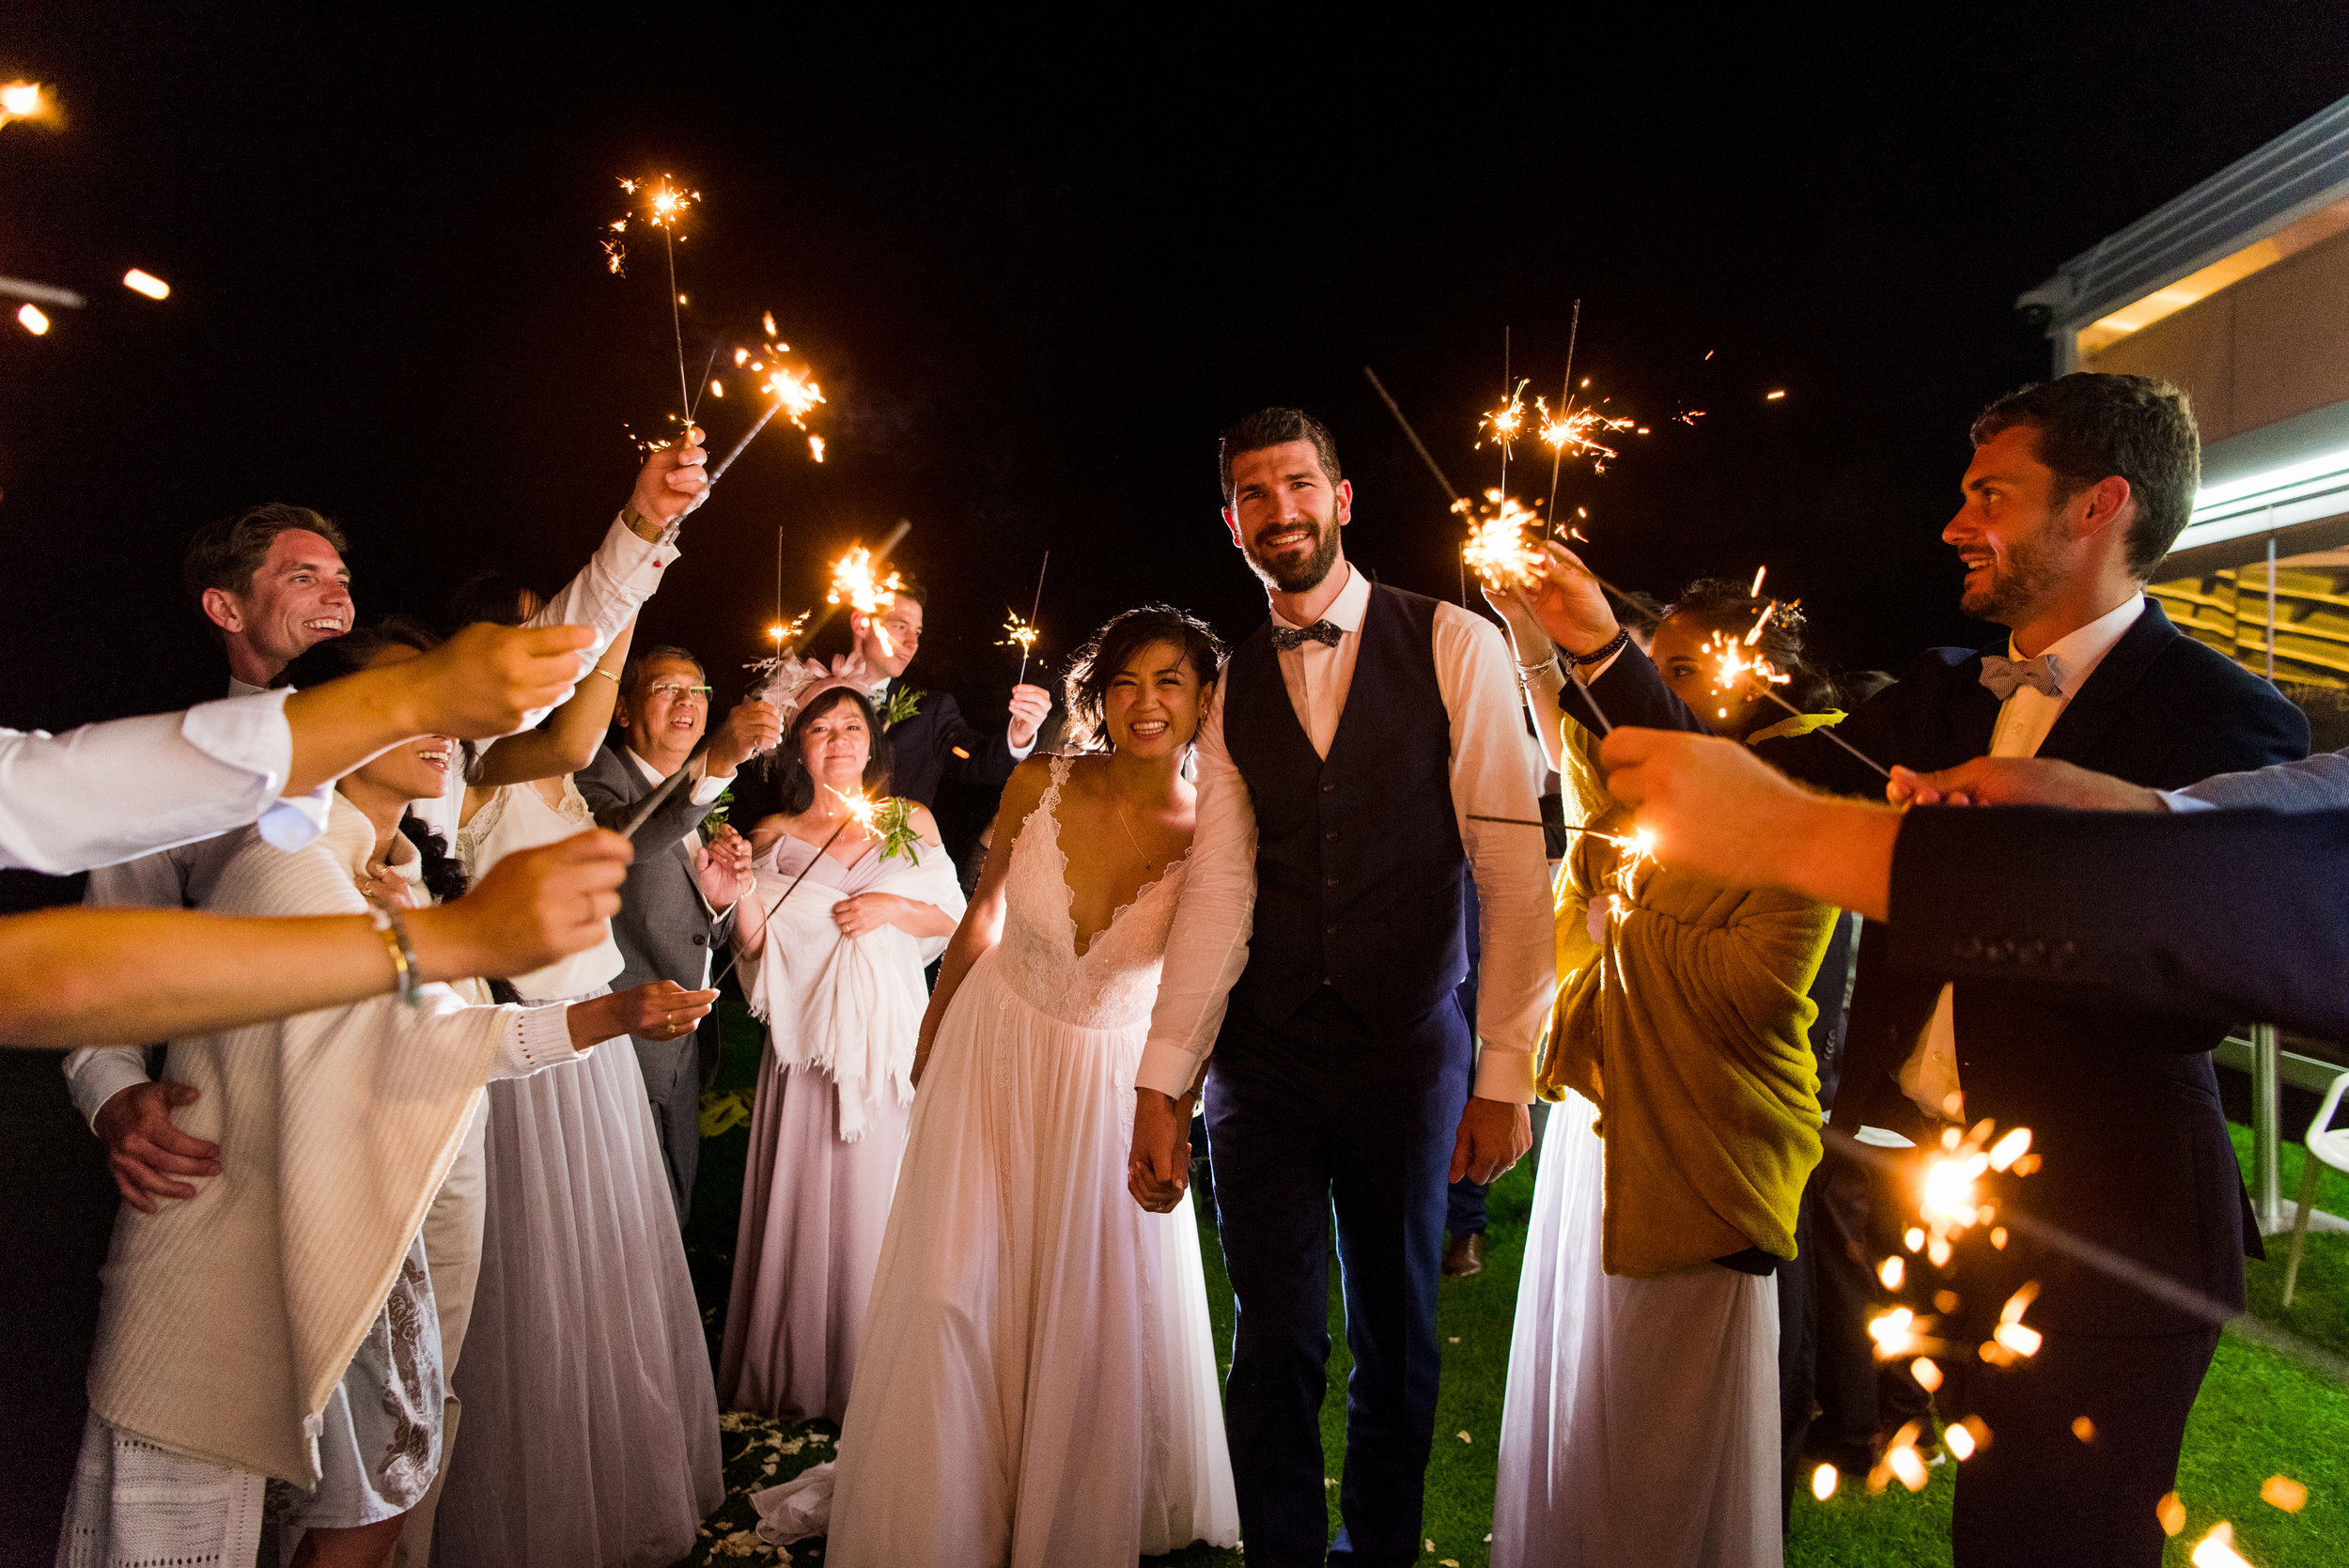 minty-frank-wedding-favorites-215.jpg